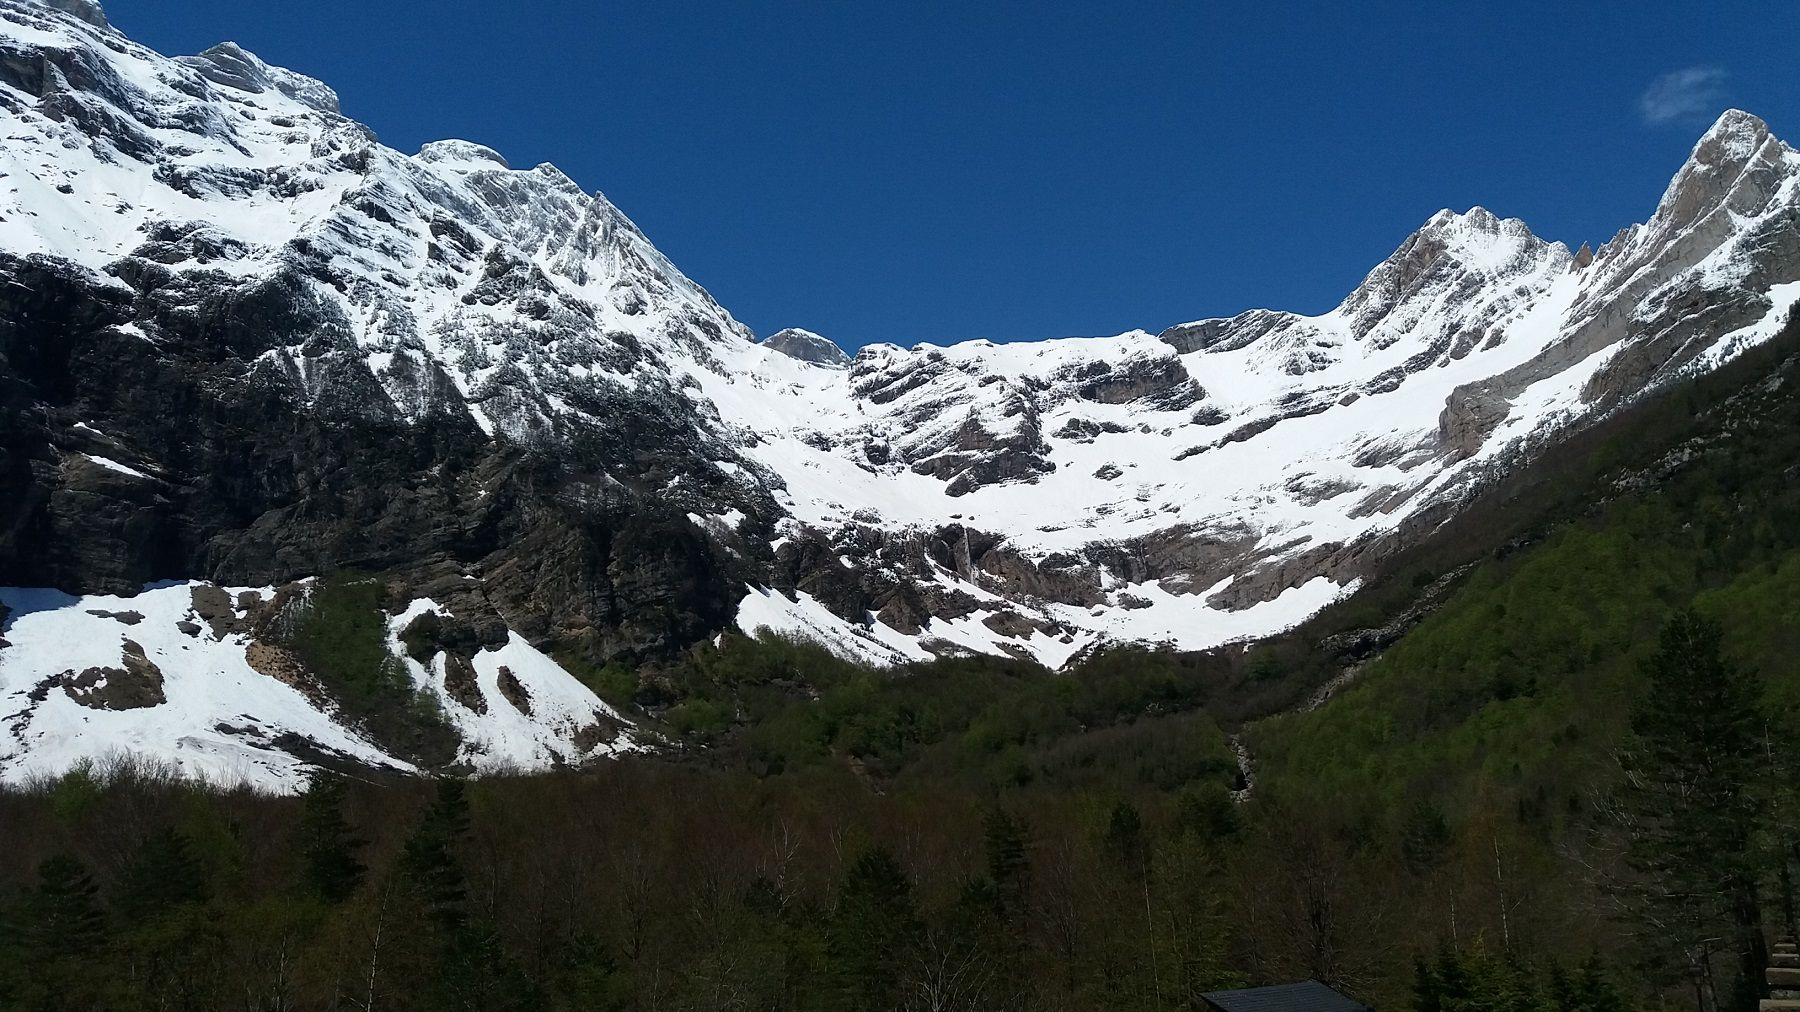 Valle de Pineta, mayo 2018. Foto: SobrarbeDigital